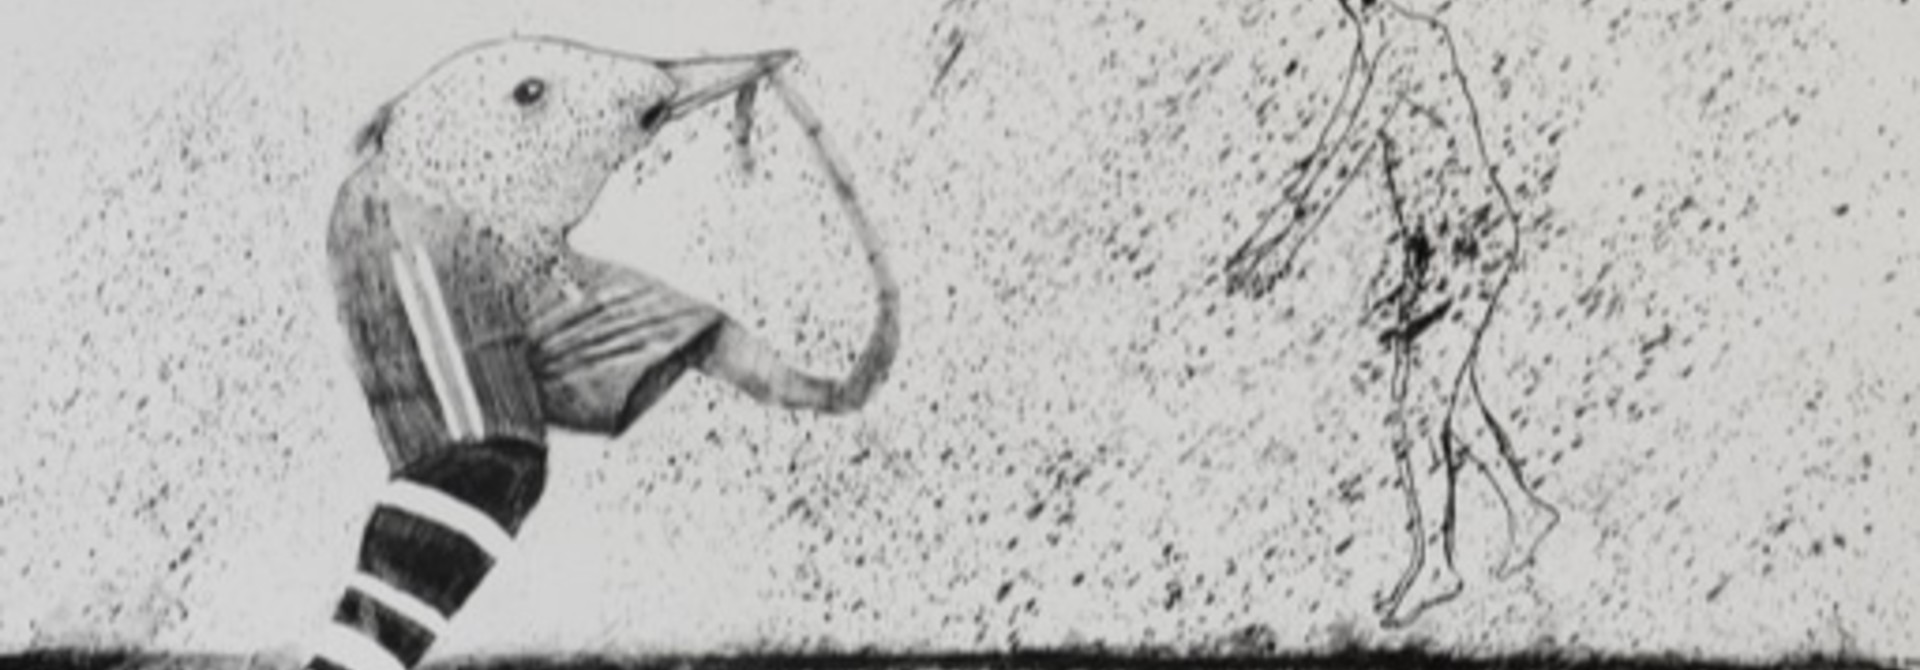 Untitled (Hockeybird)